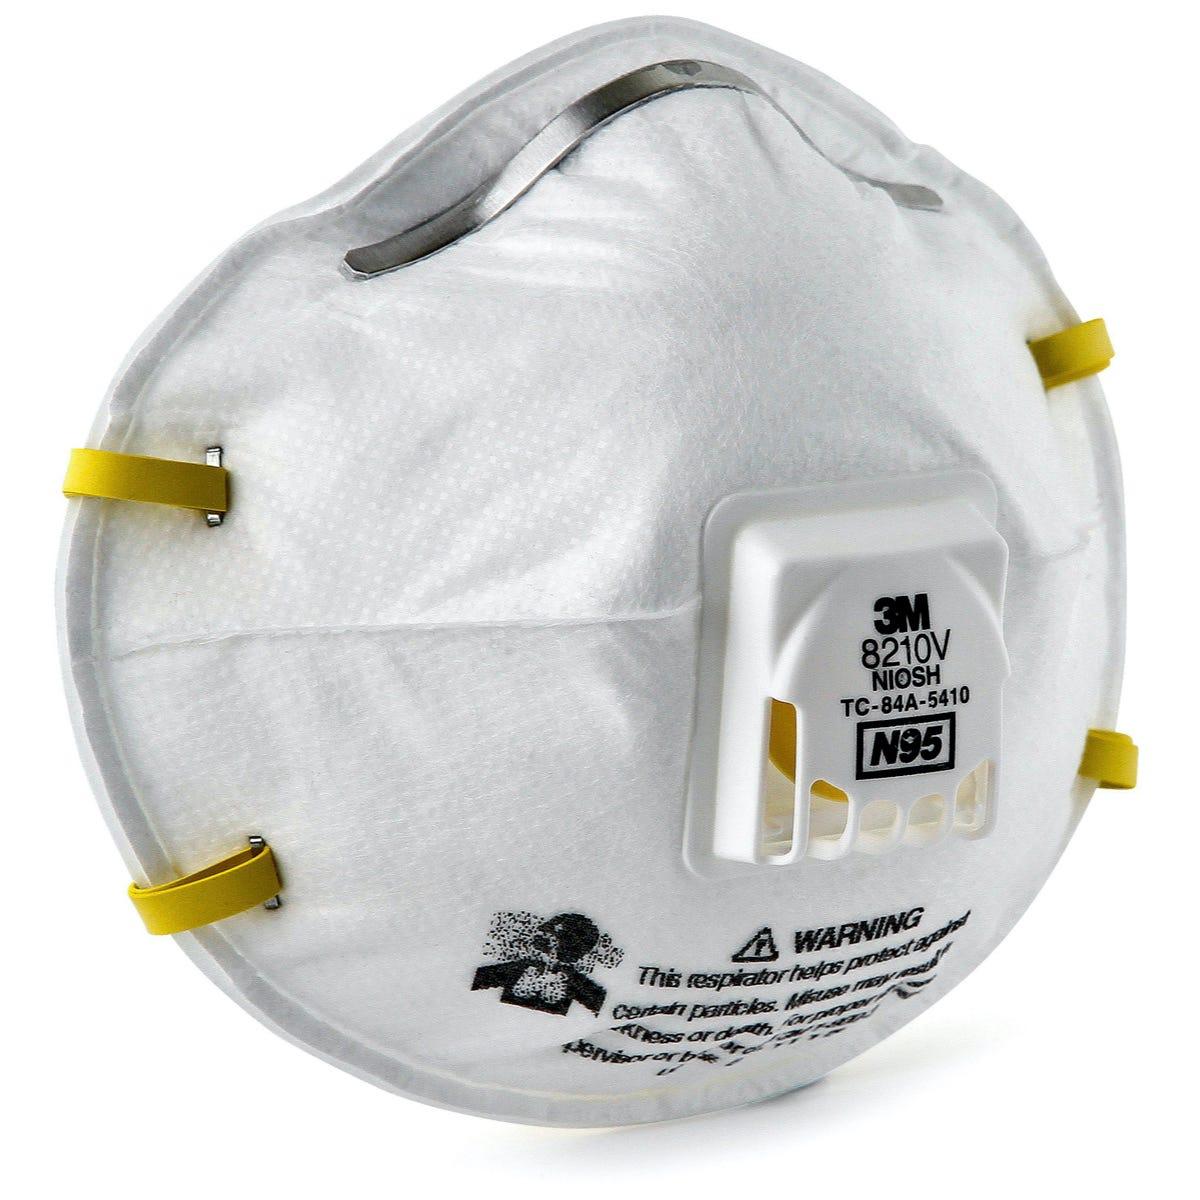 N95 Particulate Respirator, 160/Case